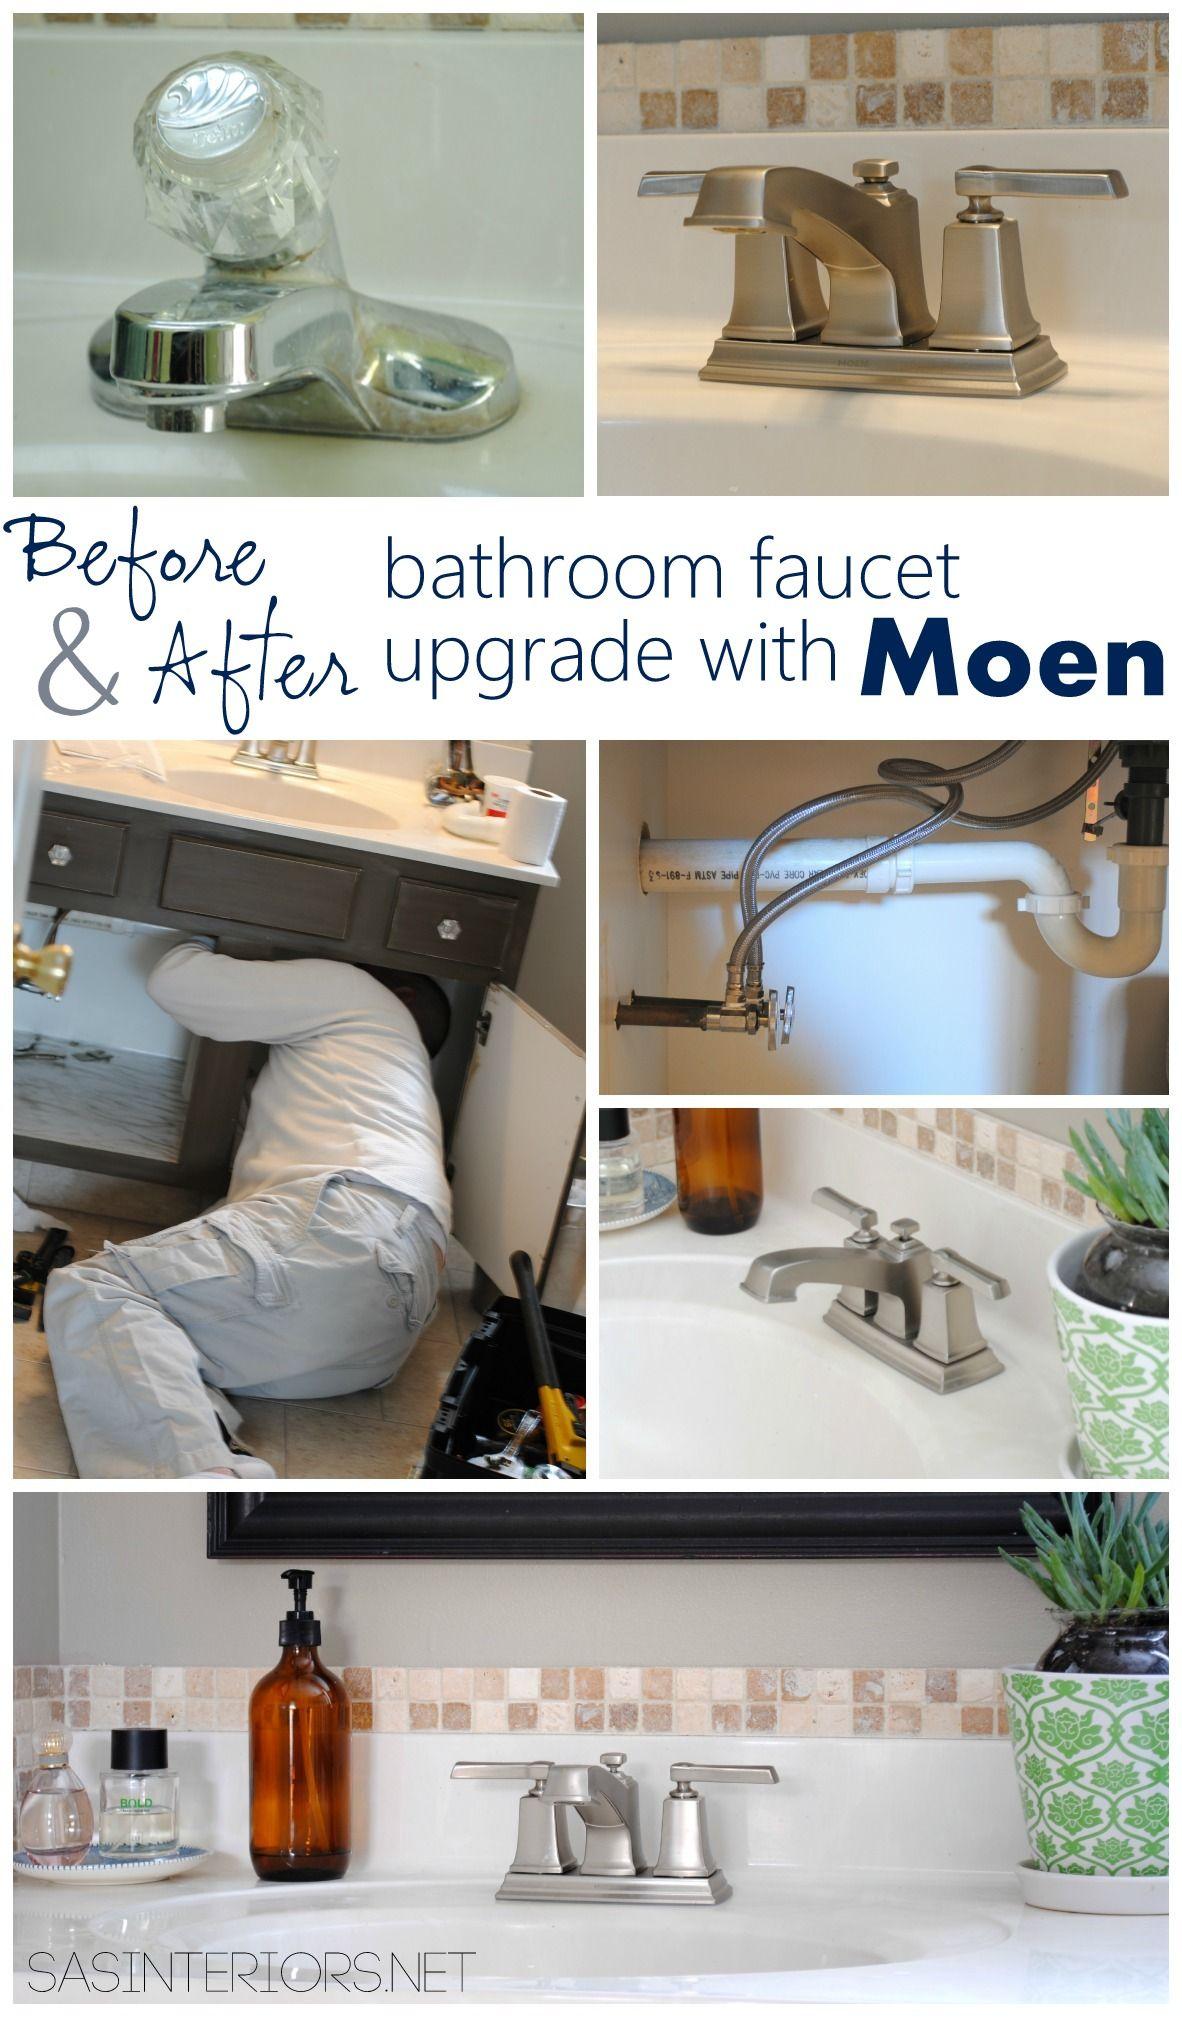 Bathroom Sink Faucet Upgrade With Moen Faucet Upgrade Neutral